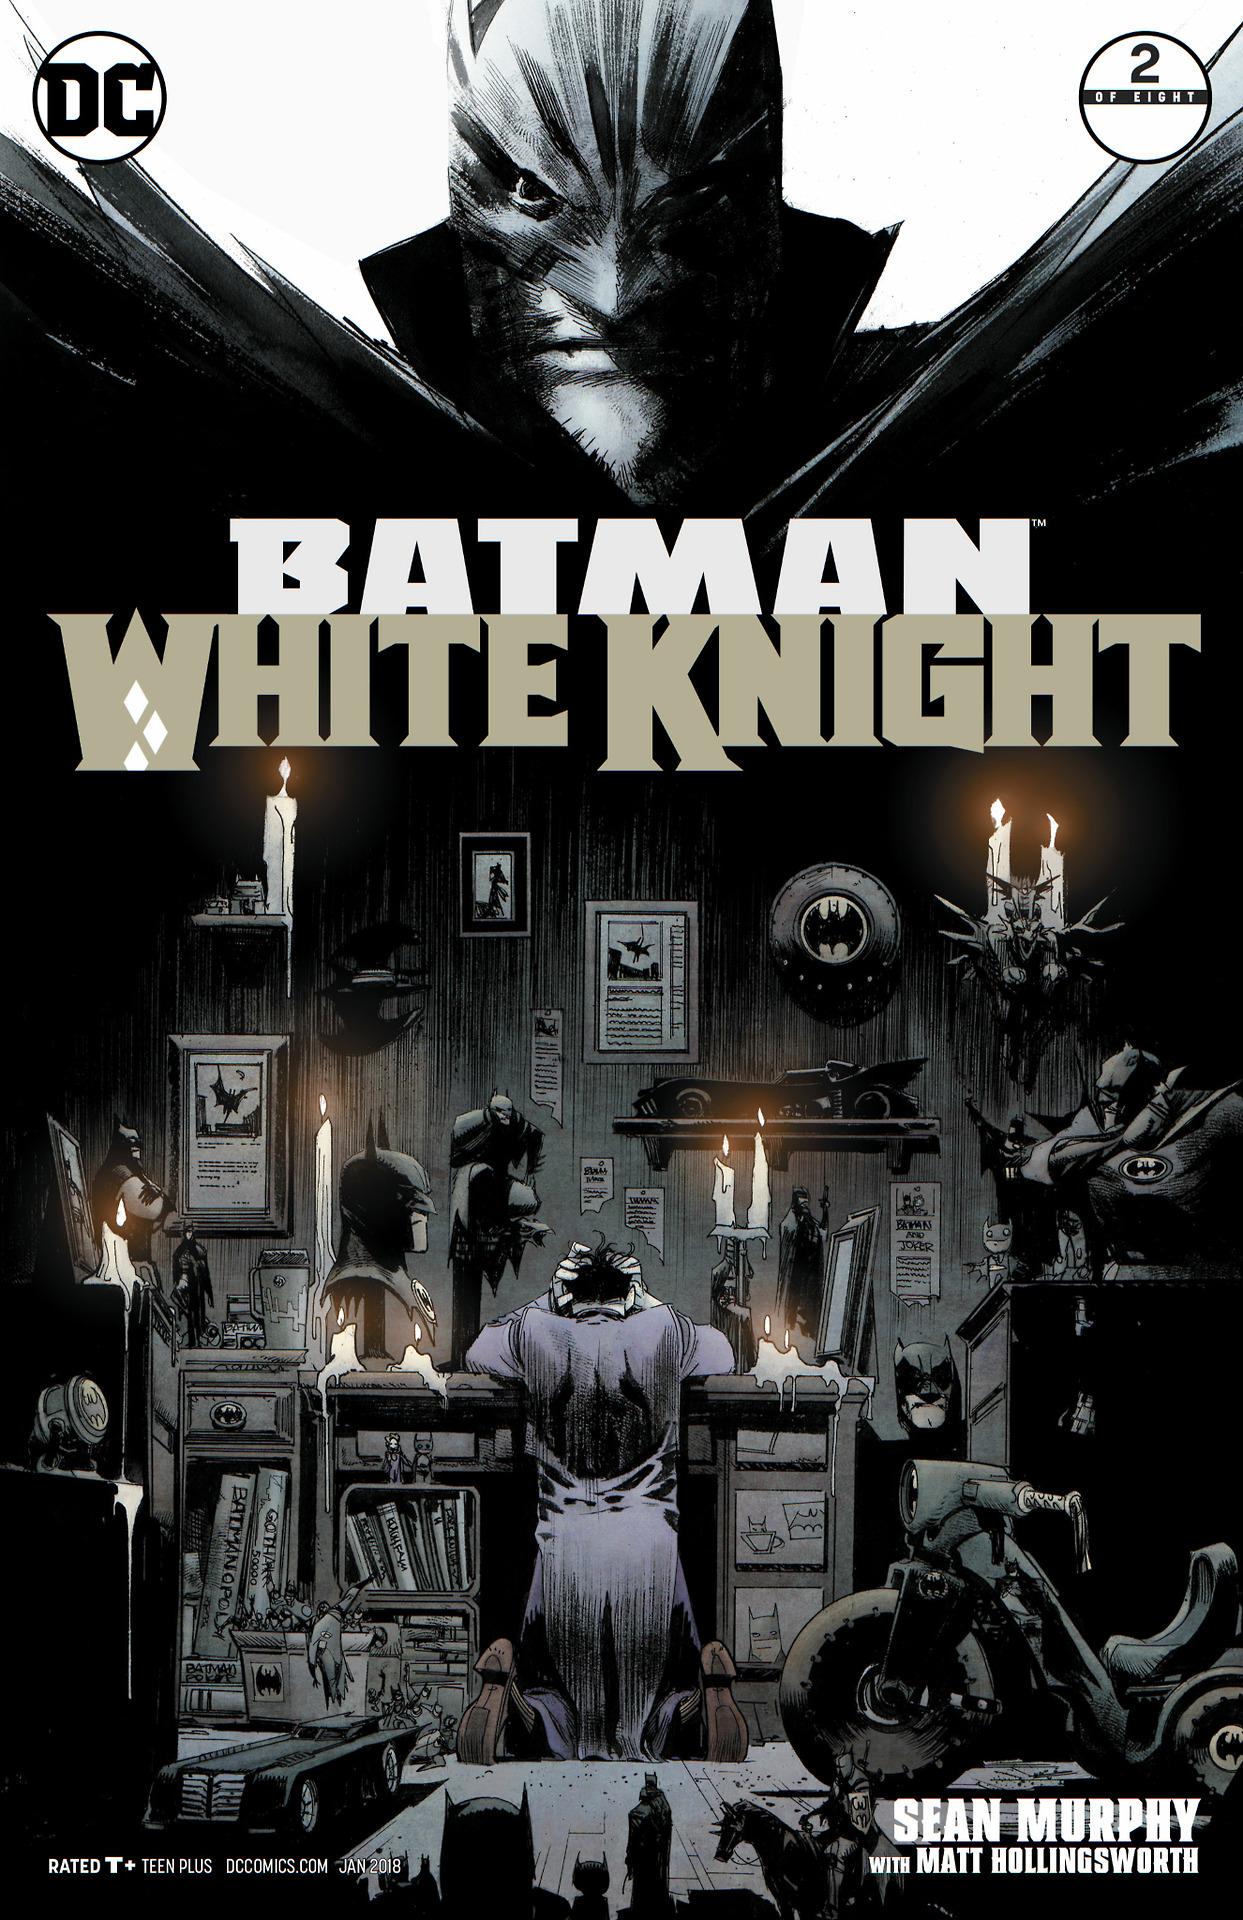 Batman: White Knight  #2 (DC, January 2018), cover